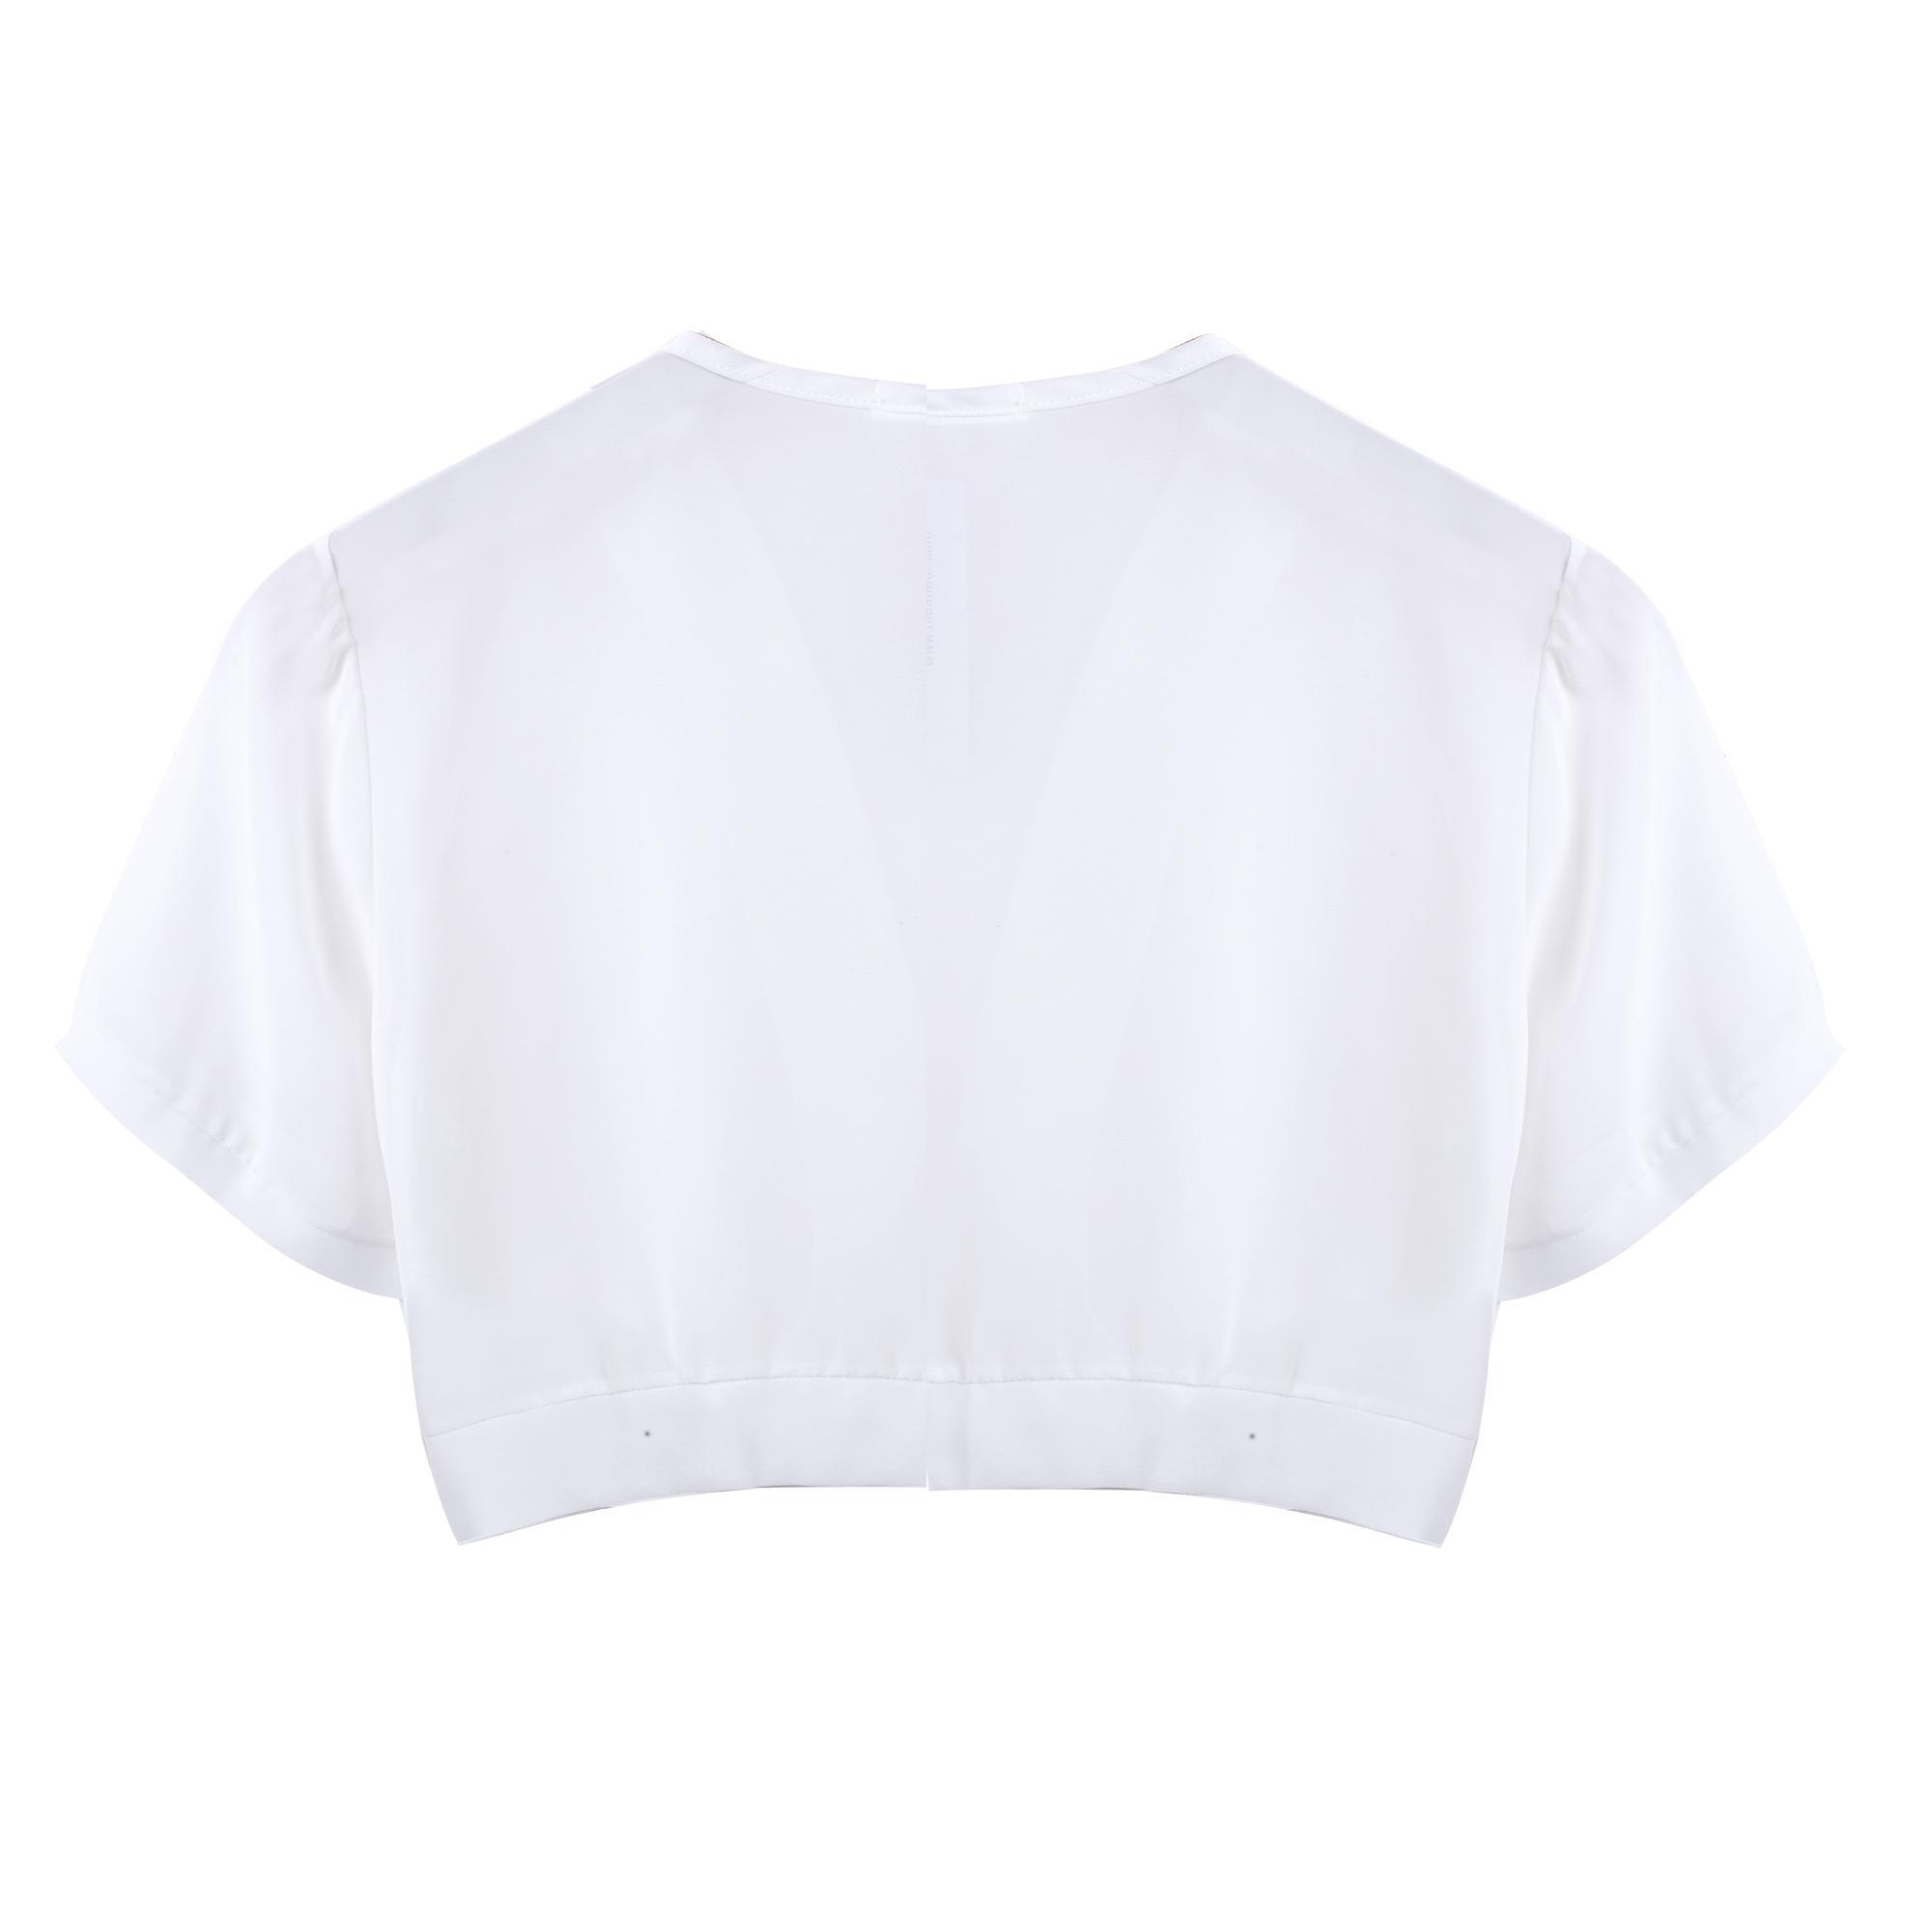 femme mousseline transparente manche courte haut cardigan bol ro paule b5ut ebay. Black Bedroom Furniture Sets. Home Design Ideas